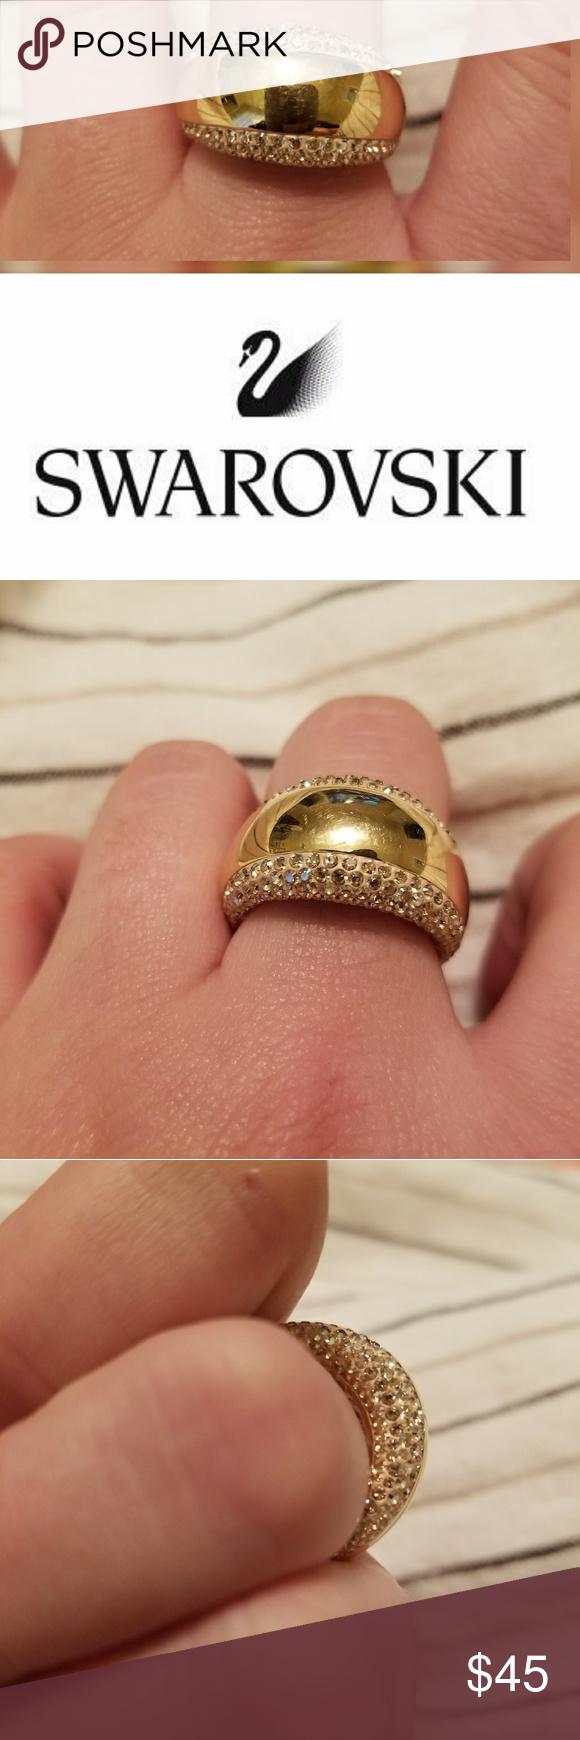 8d6d22f17699d Swarovski Gold Ring Authentic Swarovski